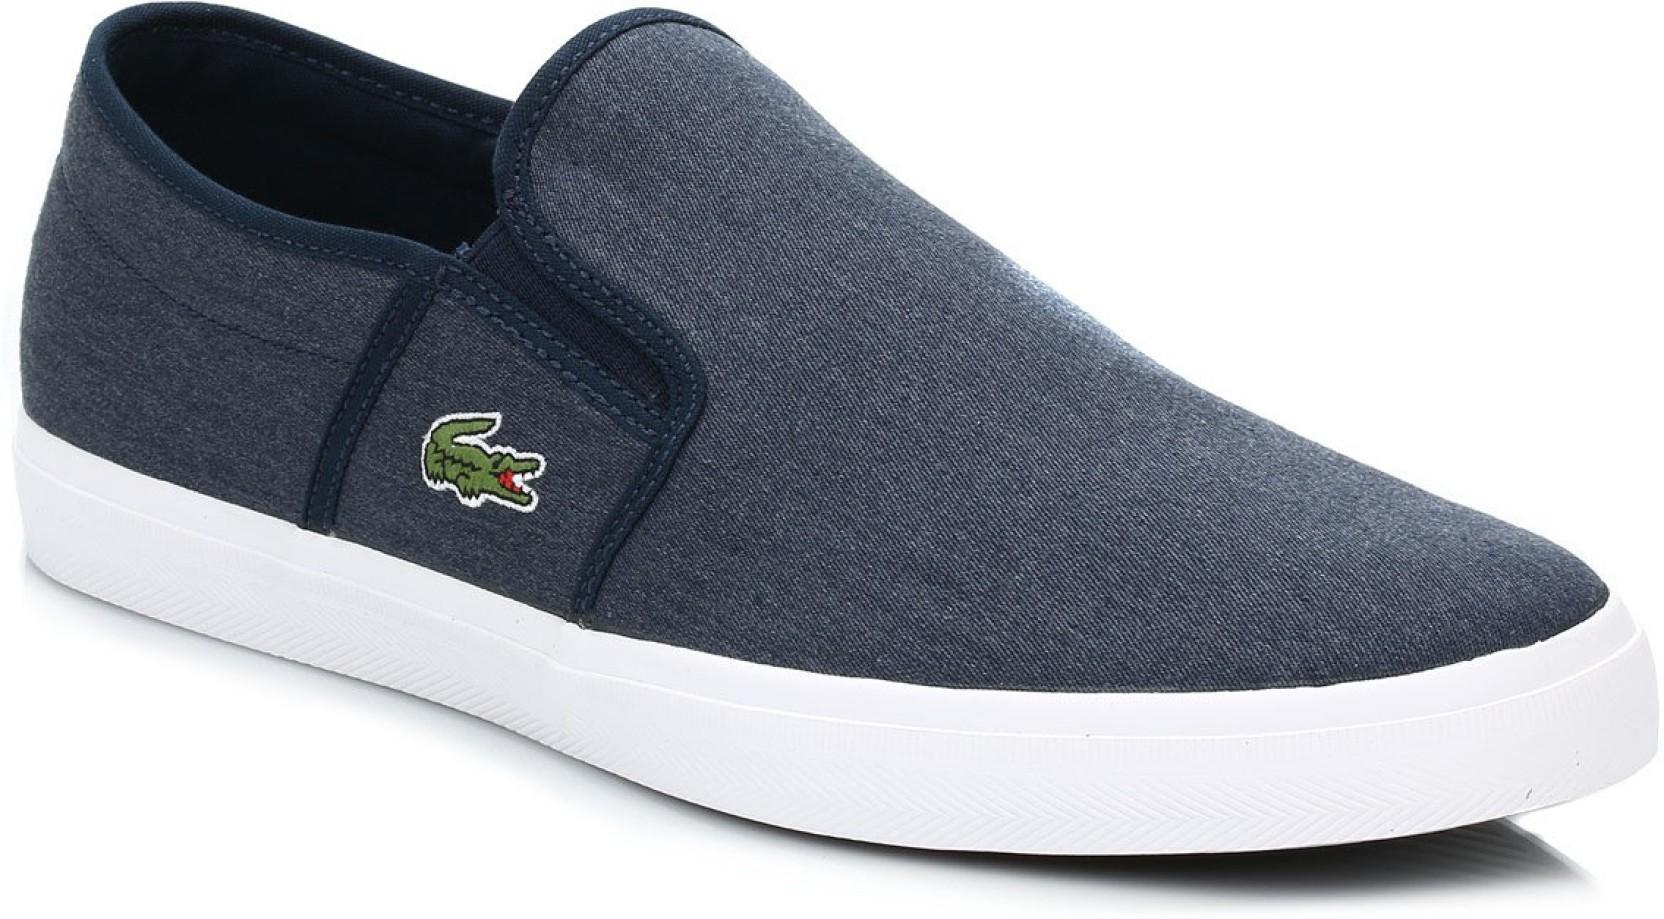 a3c56ad84 Lacoste Mens Dark Blue Gazon Sport CSU2 Canvas Trainers Casual Shoes For Men  (Blue)